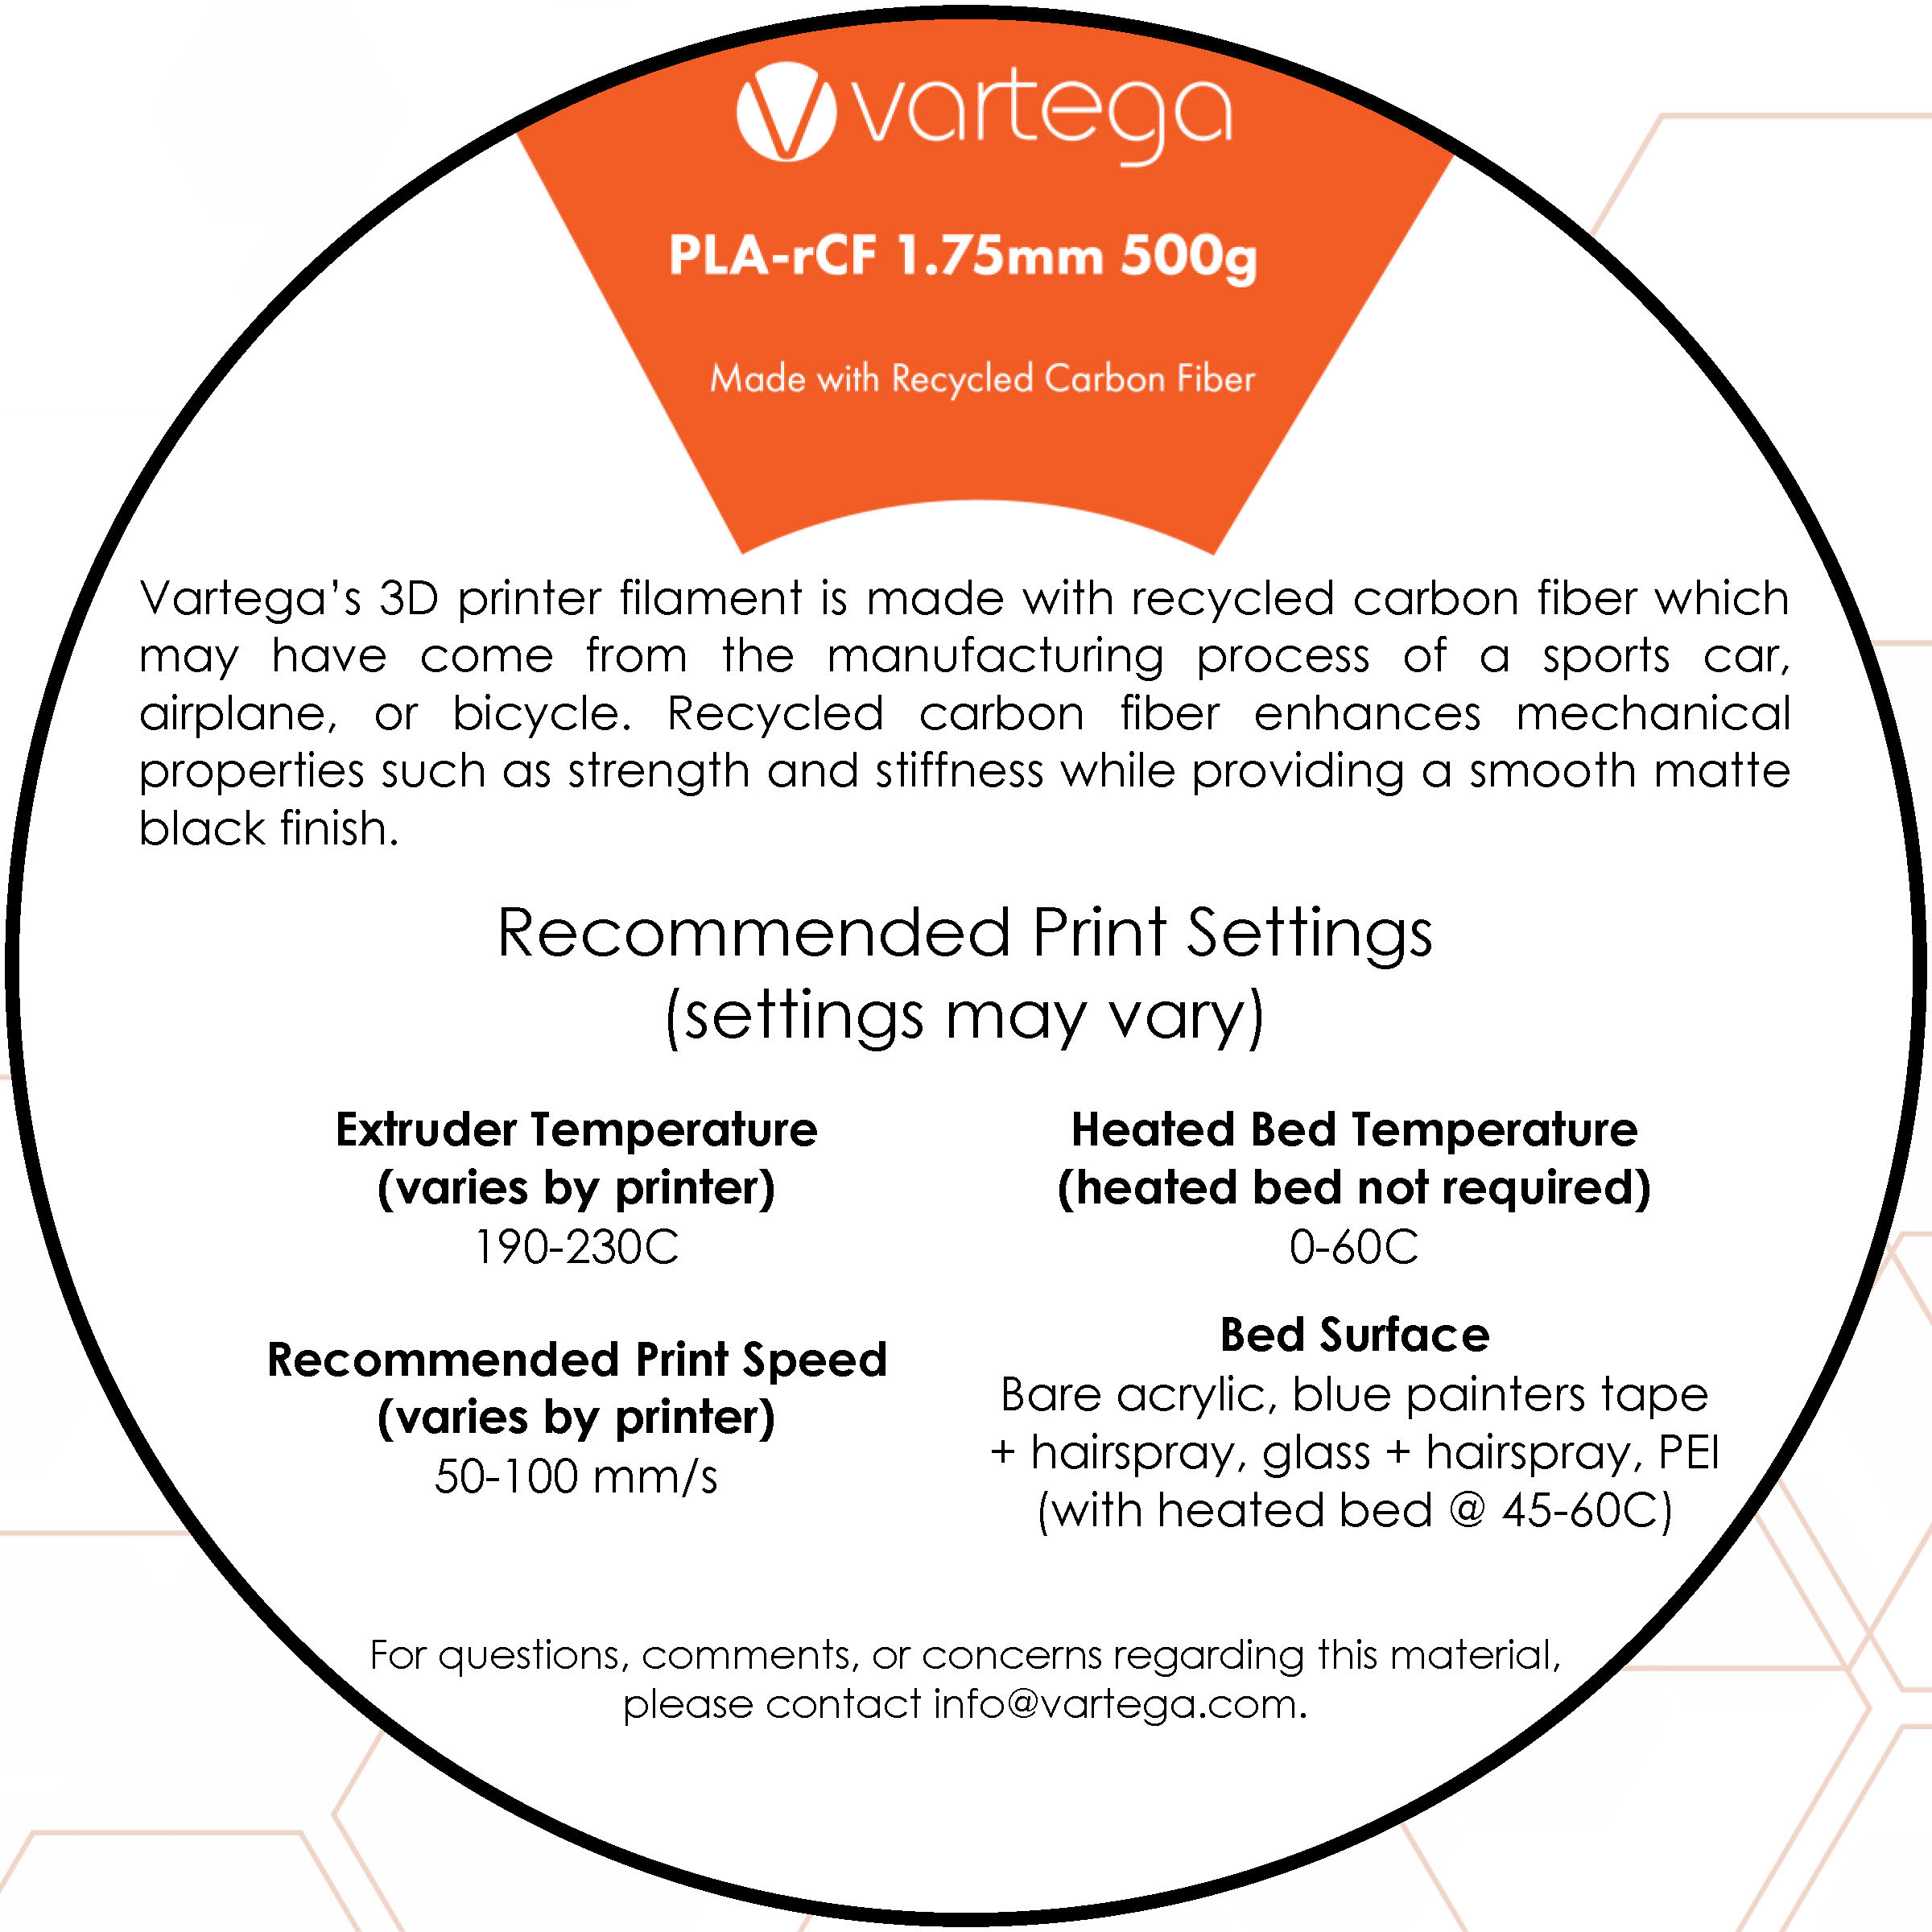 Vartega PLA Instruction Card